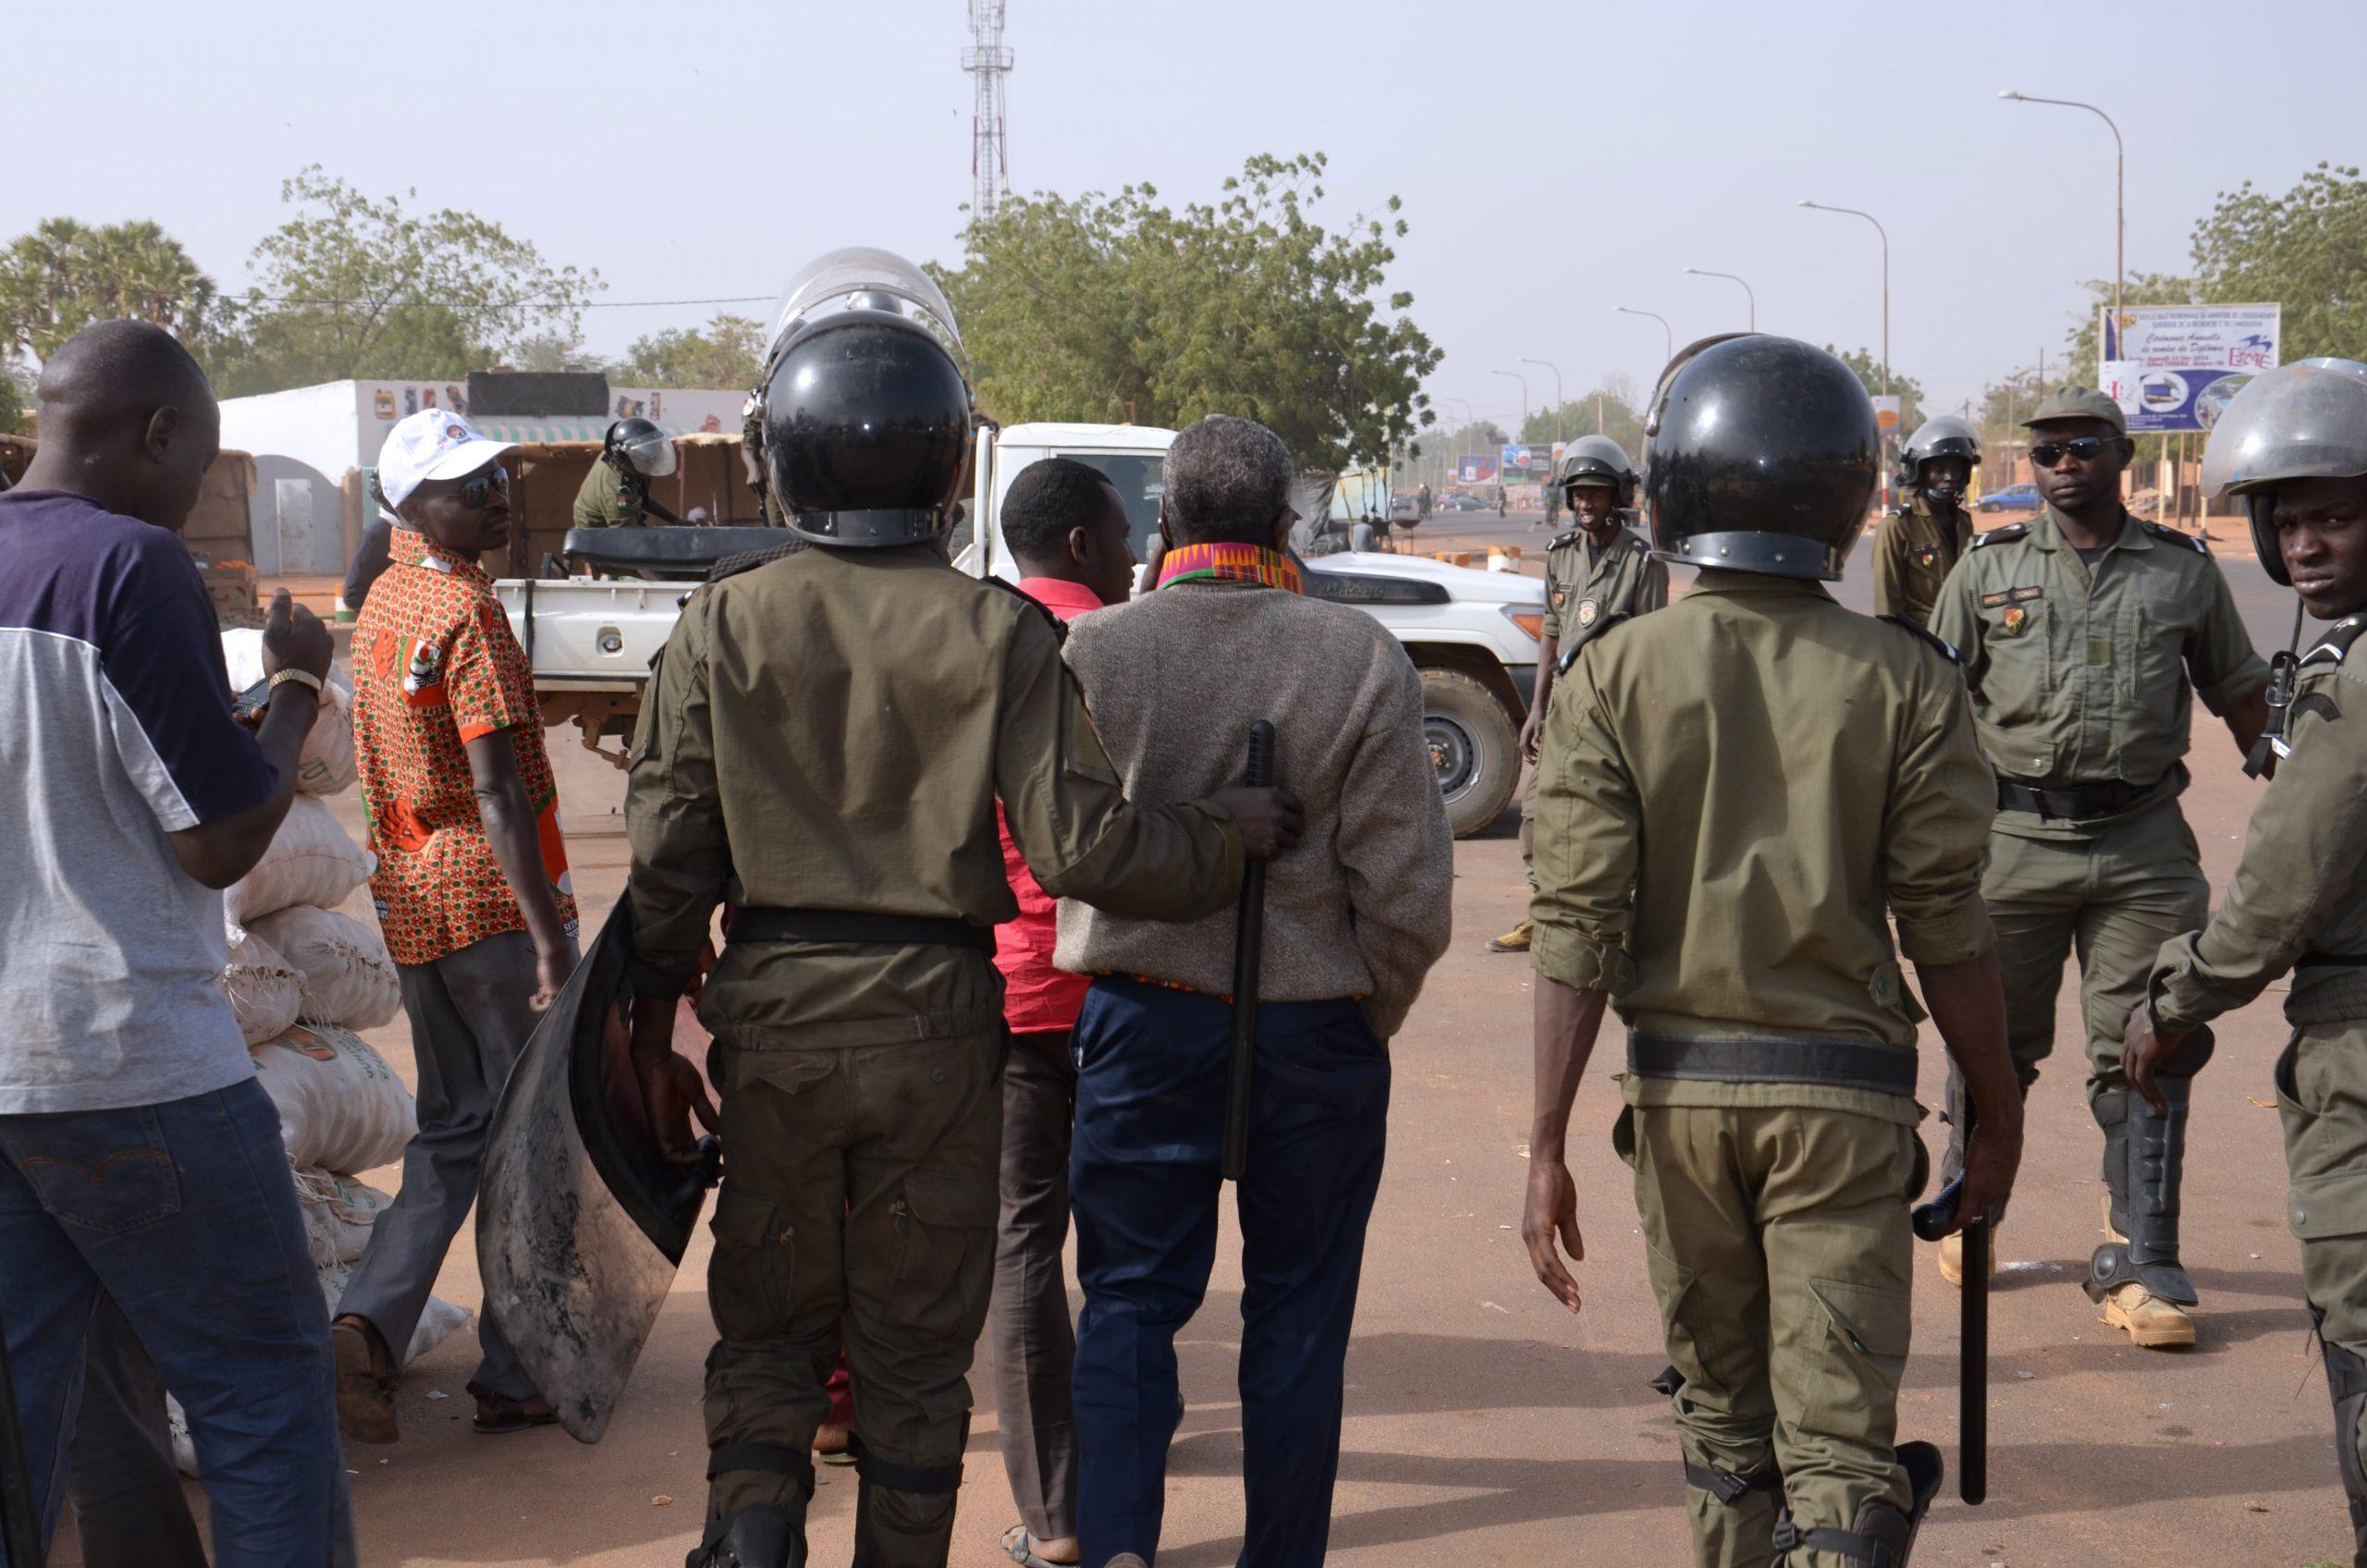 Qui saisir en cas de violences policières ?